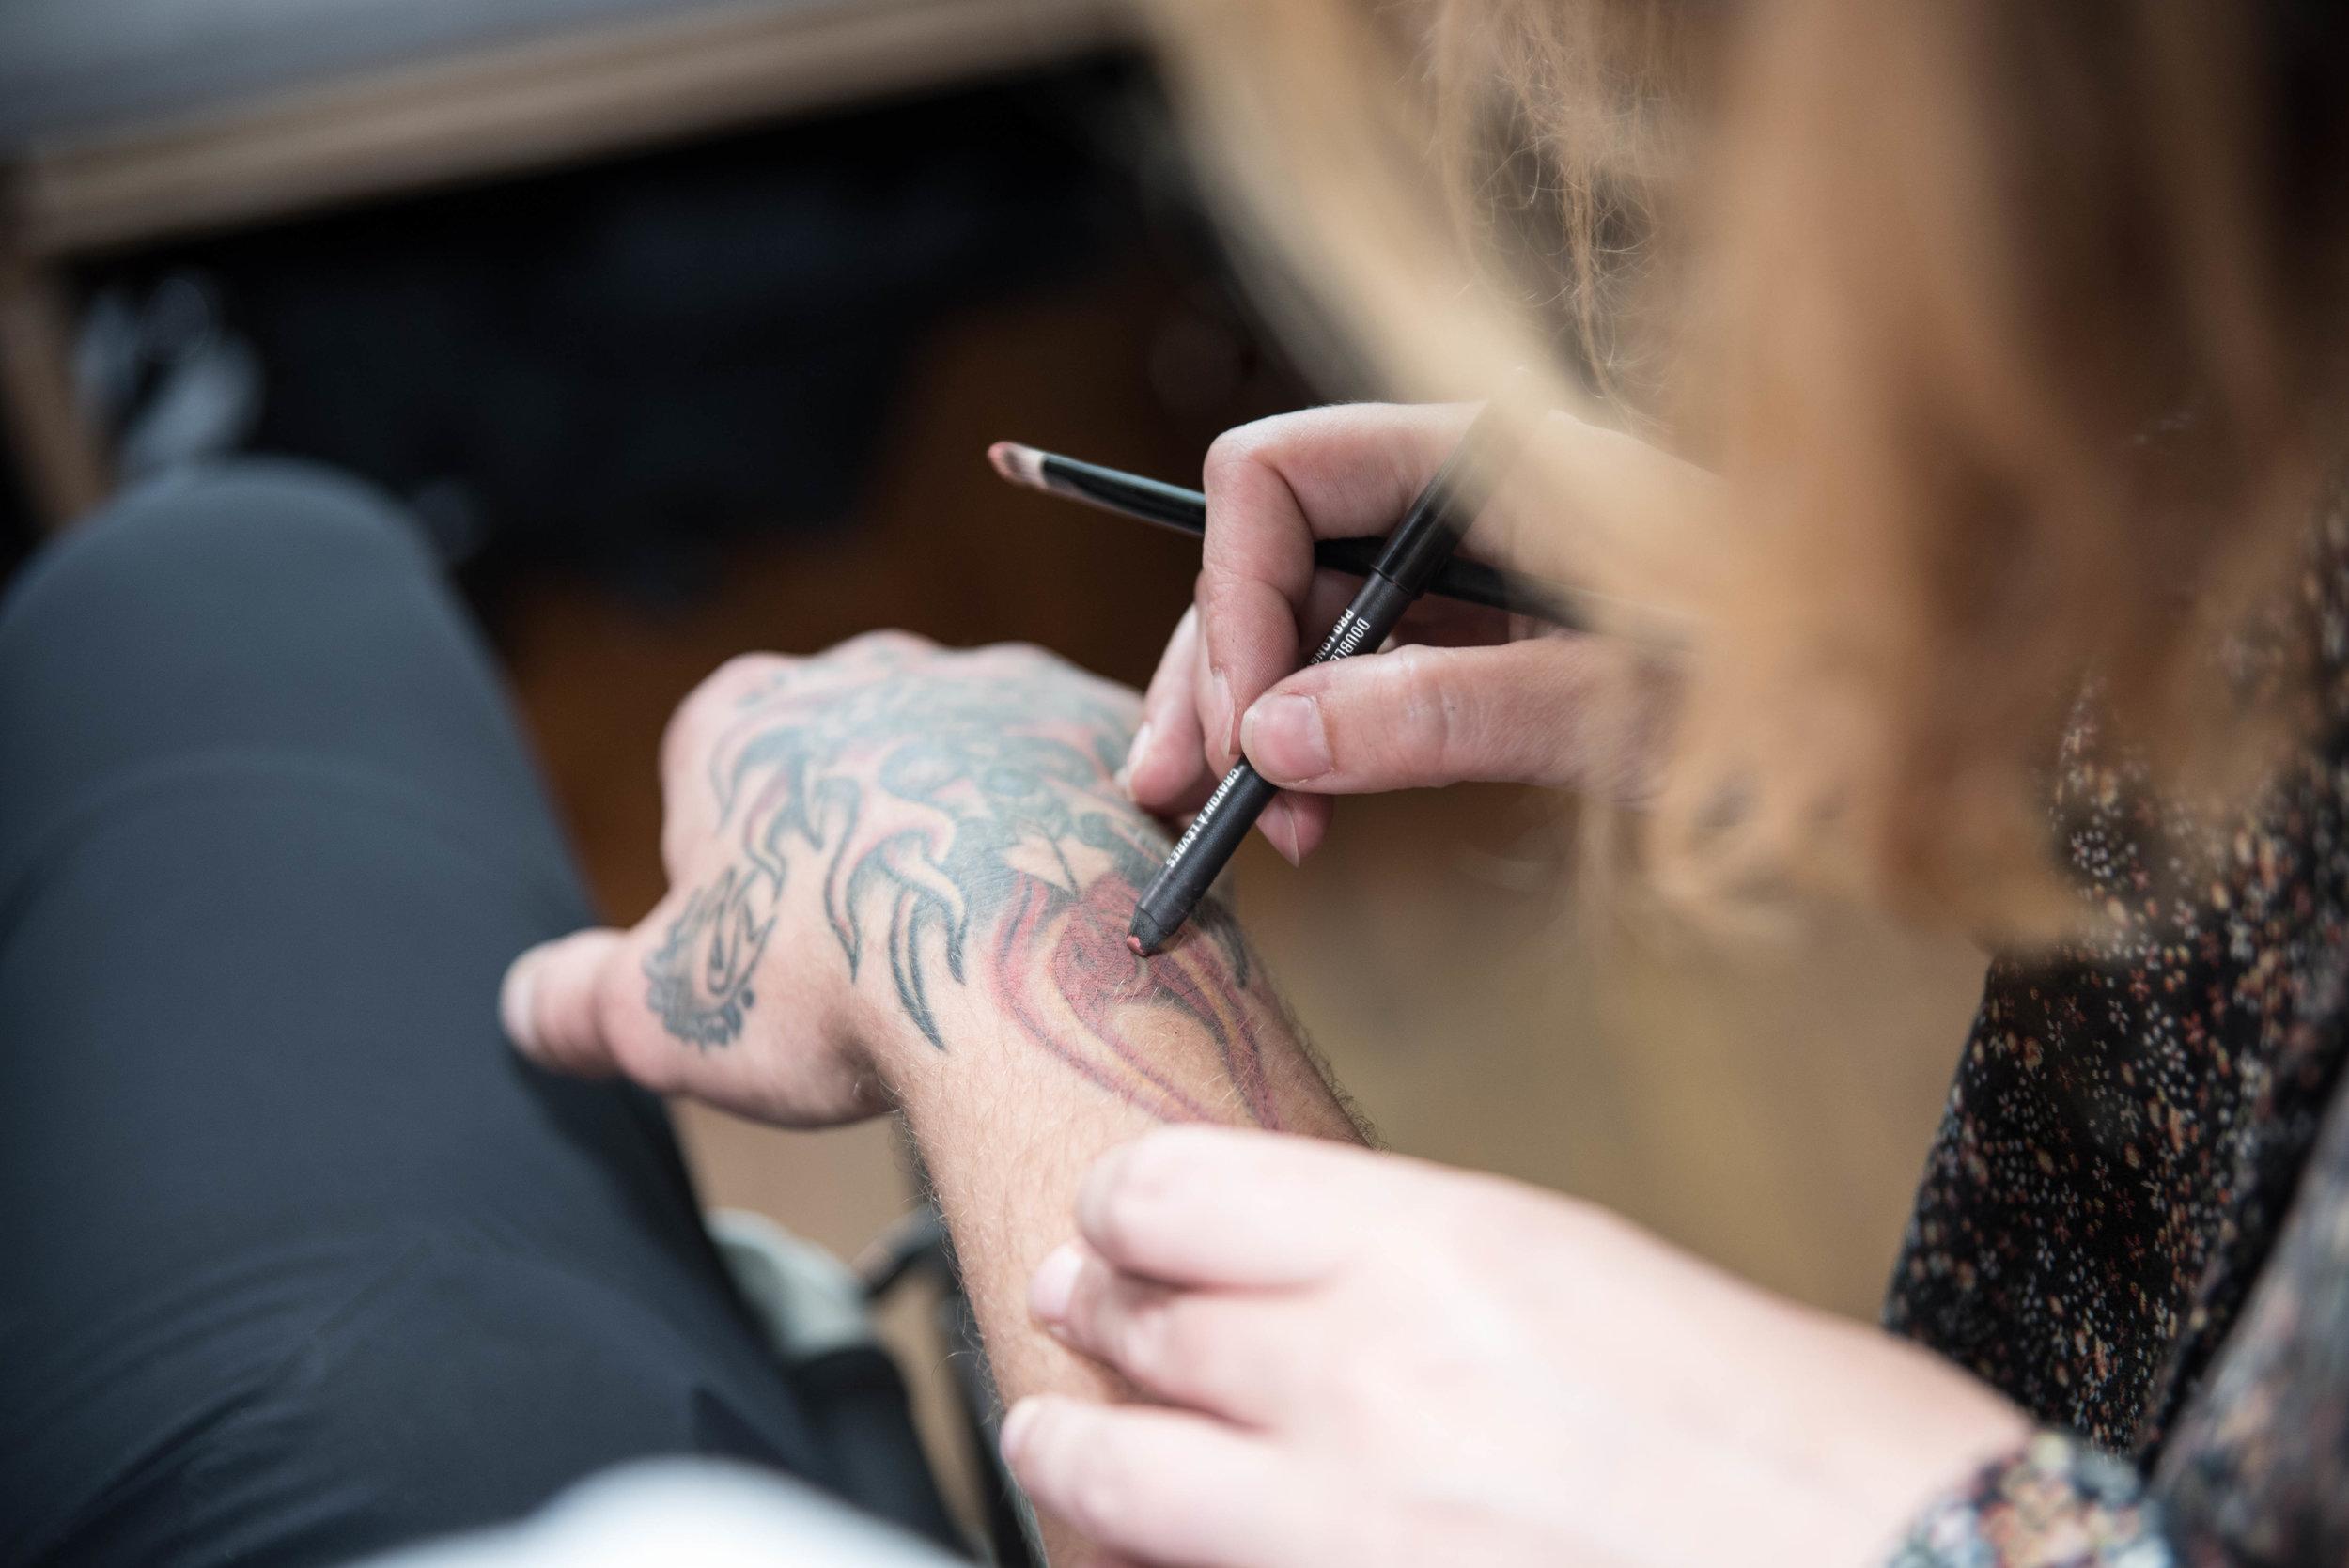 cleveland makeup artist tattoo cover up